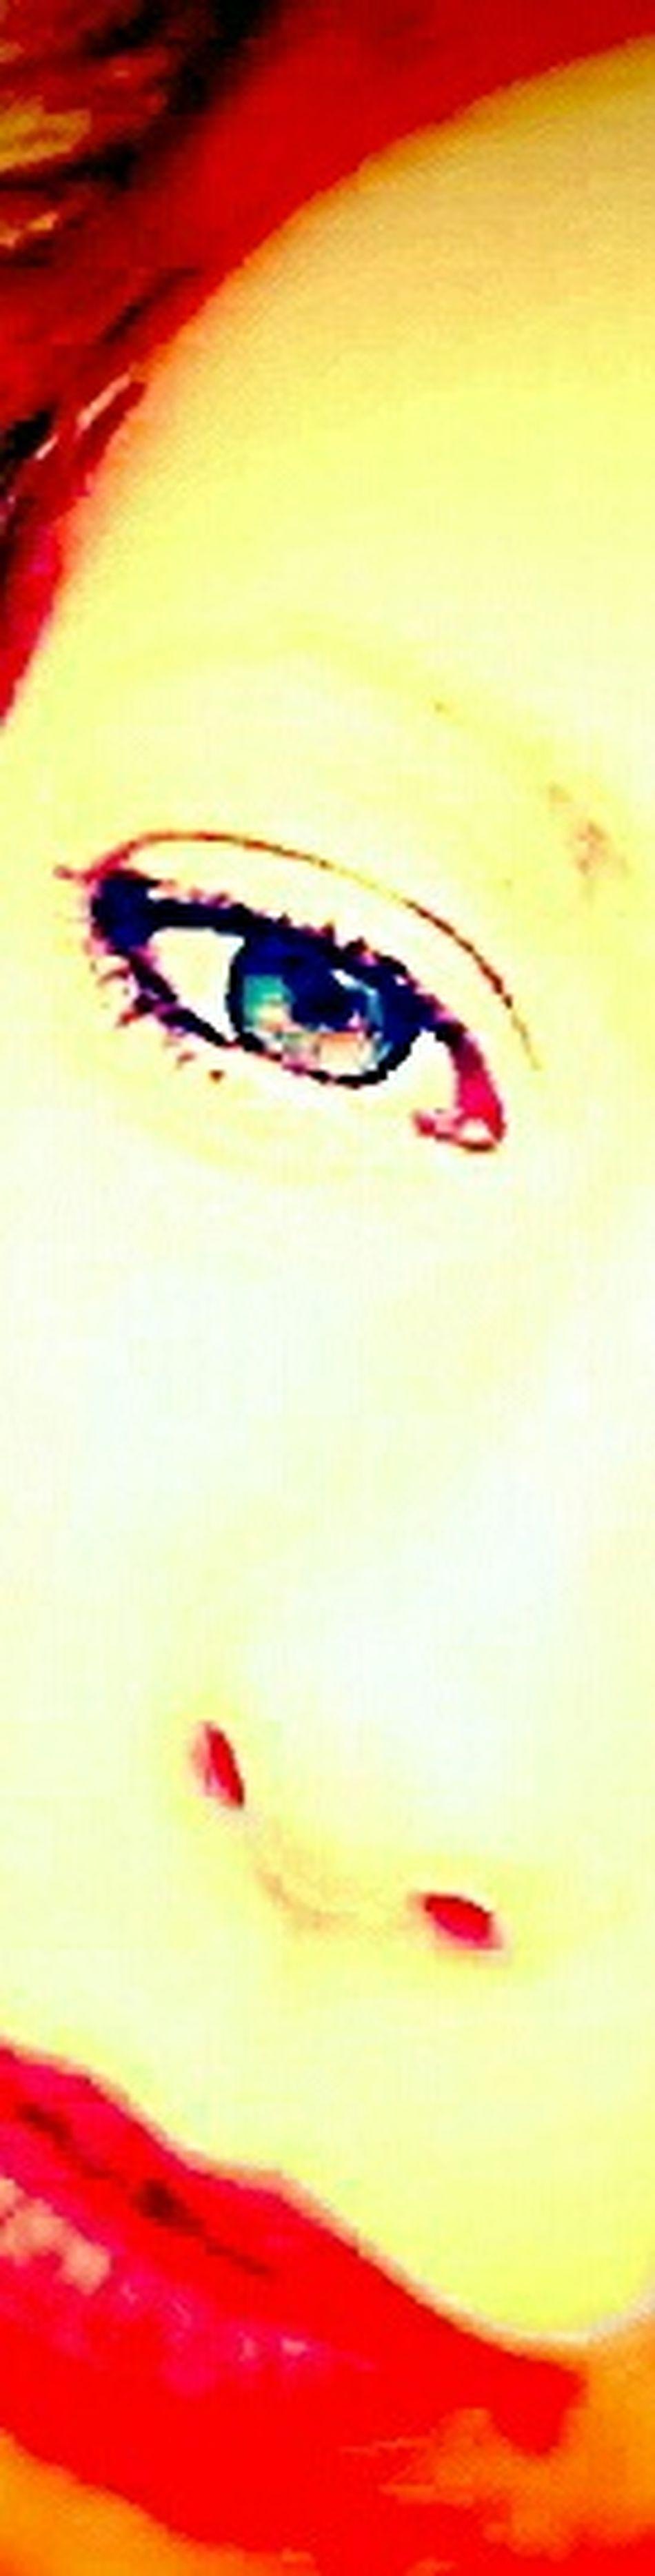 Eye Me face